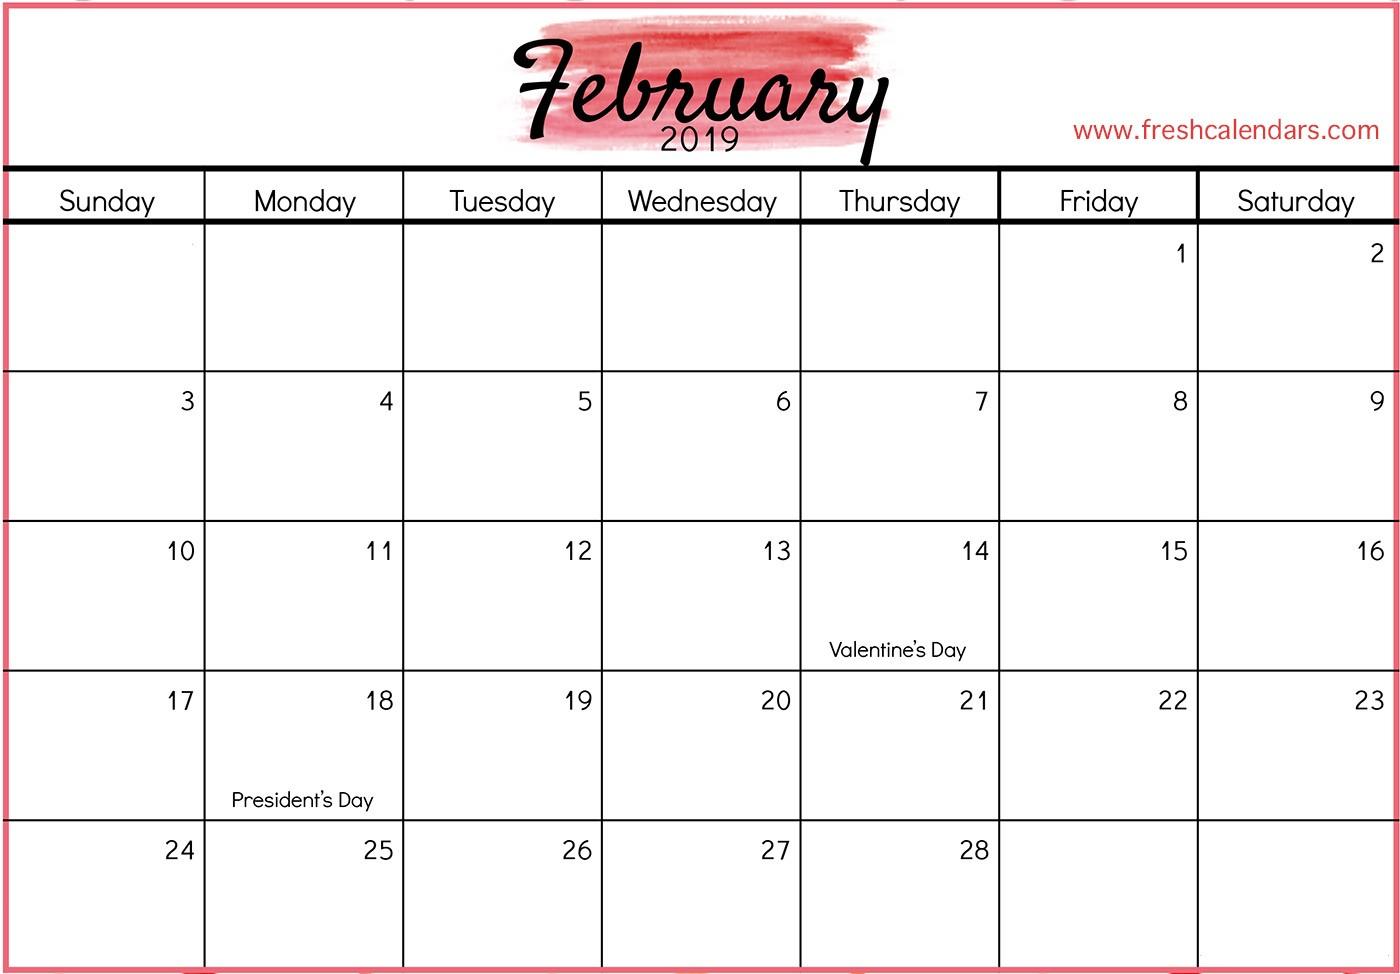 Free Printable February 2019 Calendar Blank February 2019 Calendar Printable Templates